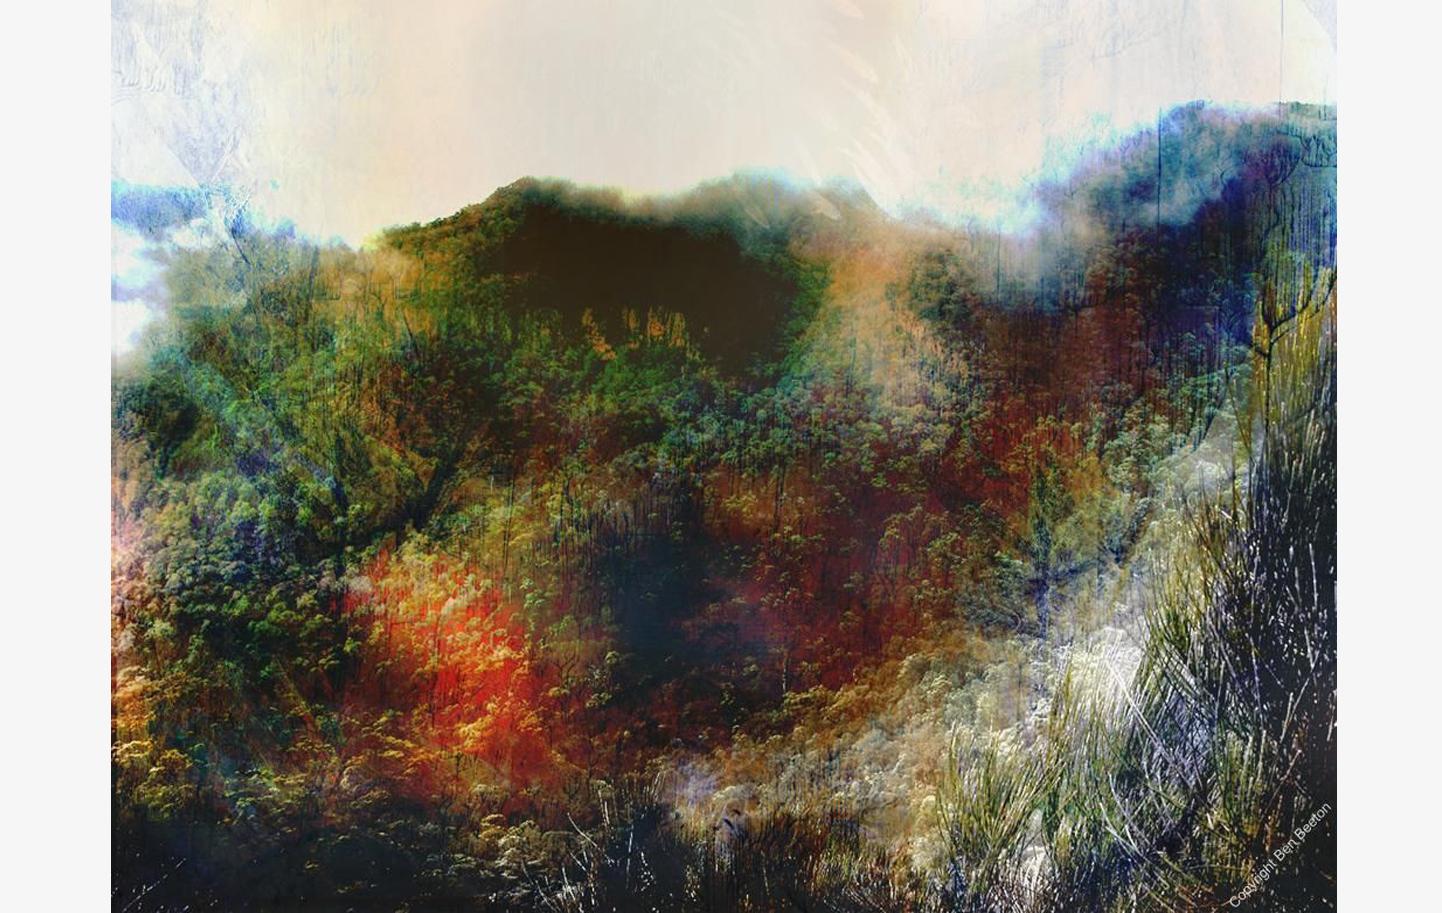 Impressions on the Lyre Bird Track